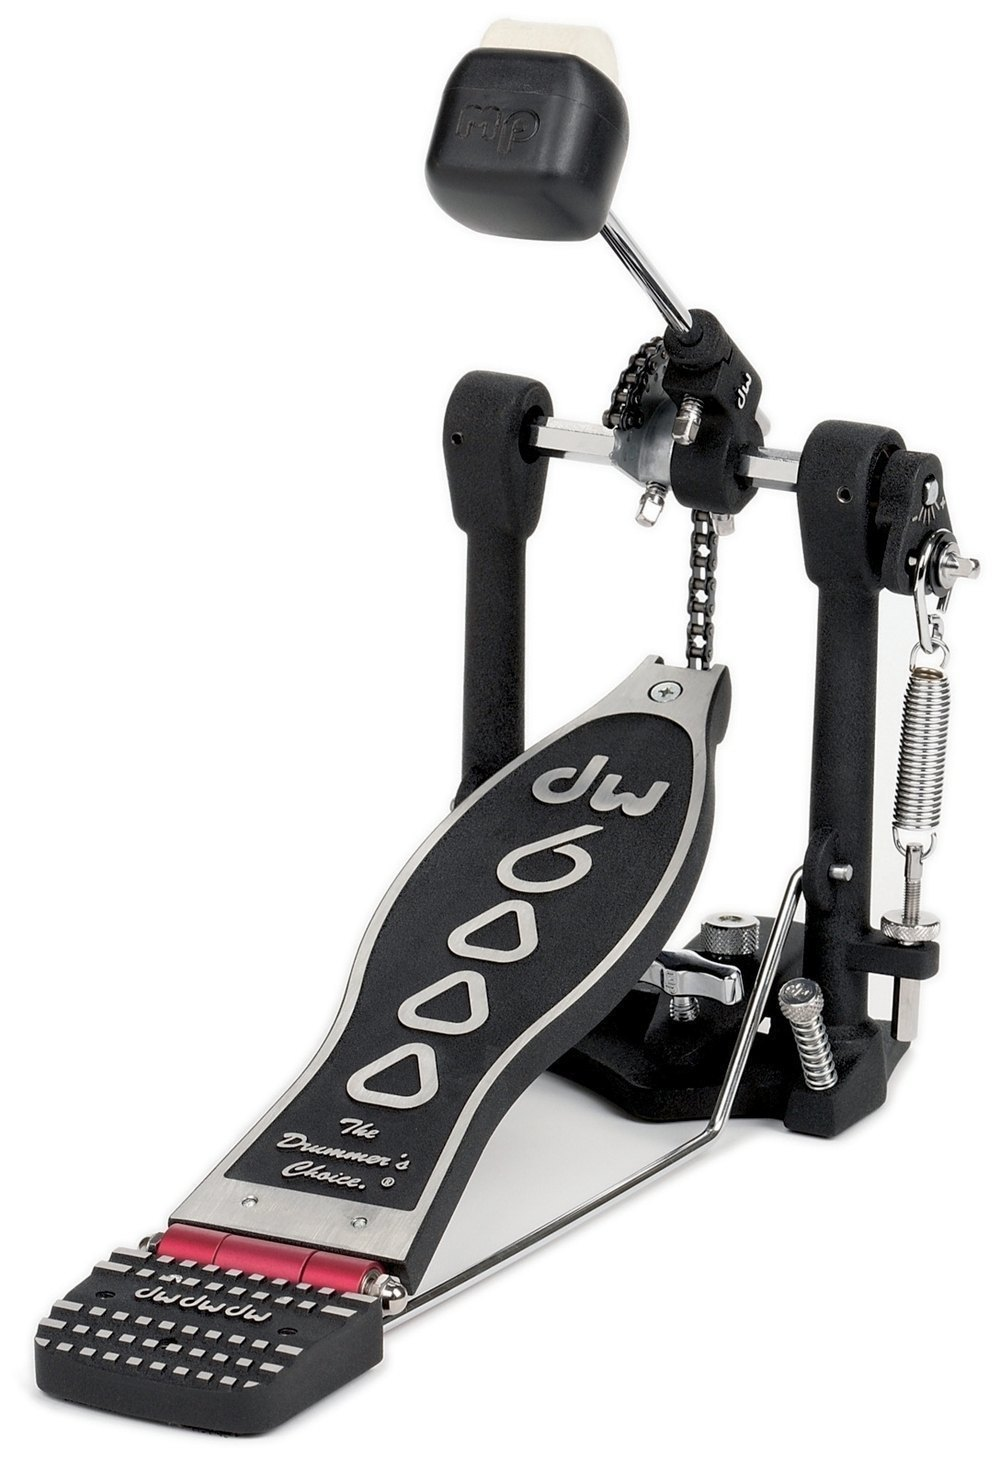 DW 6000 Turbo Single BassDrum Pedal